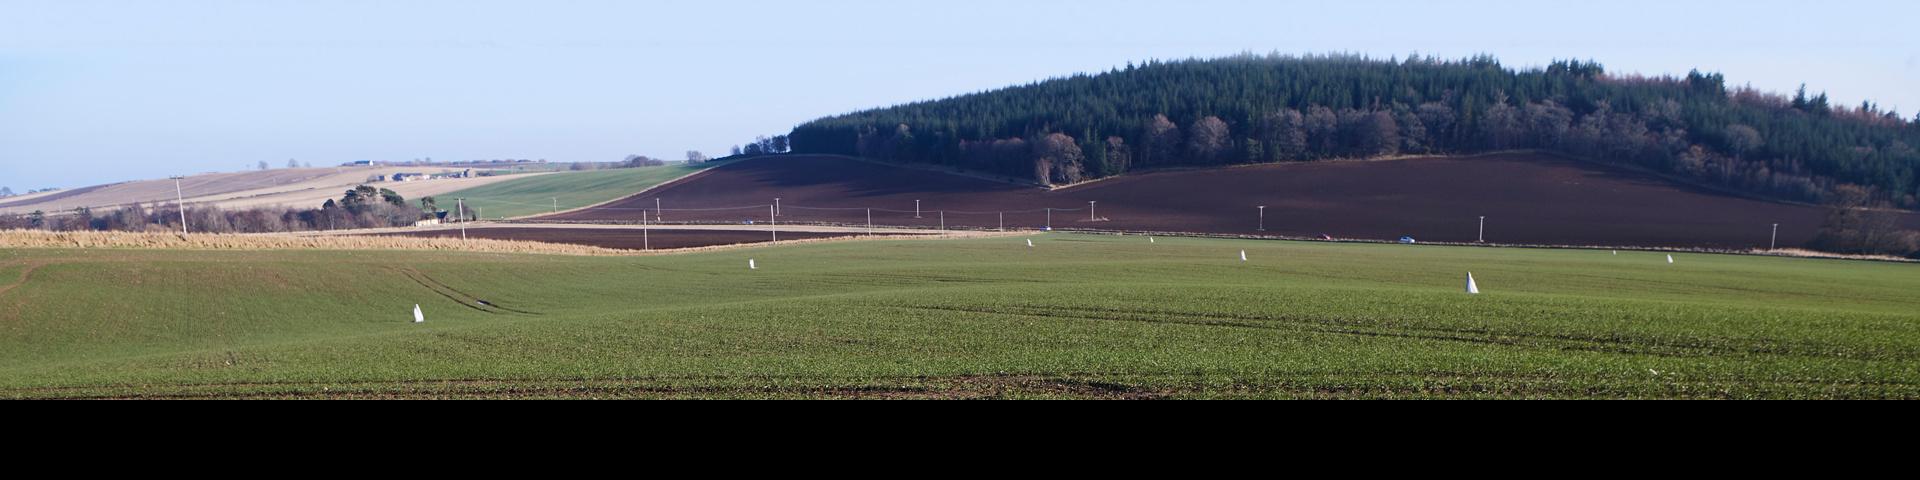 Farm landscaoe